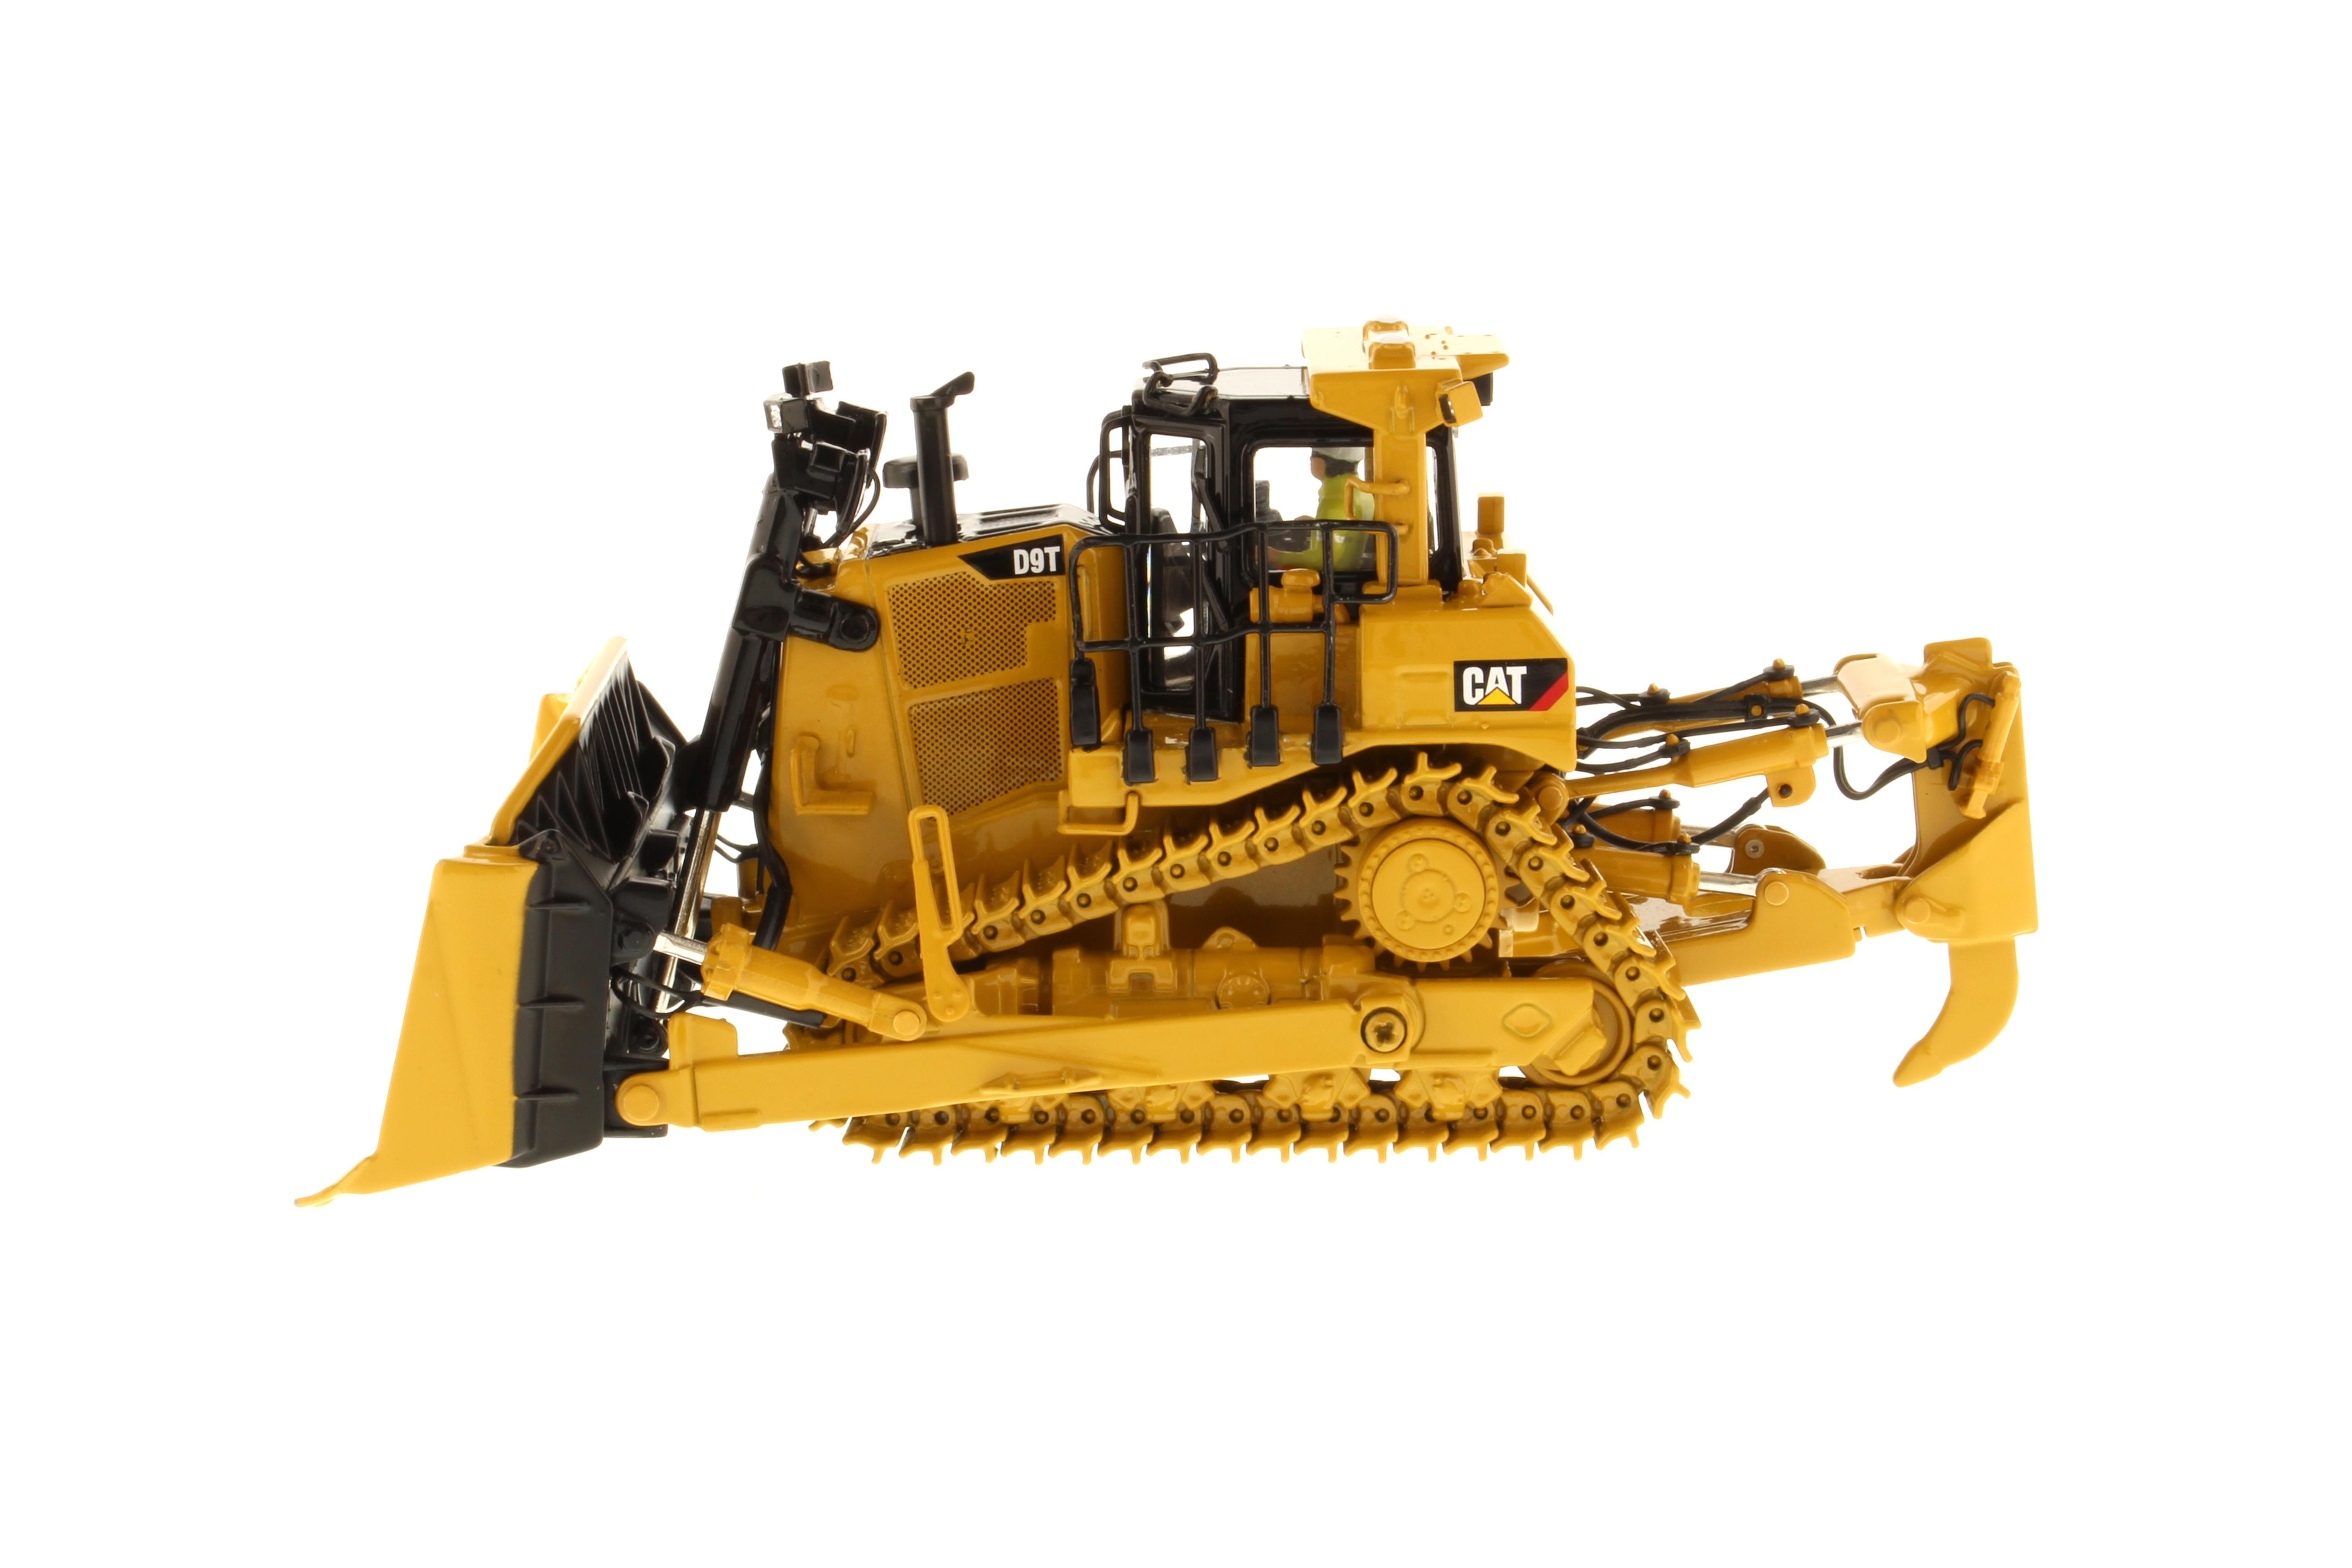 Caterpillar D9T Track-Type Tractor-Dozer